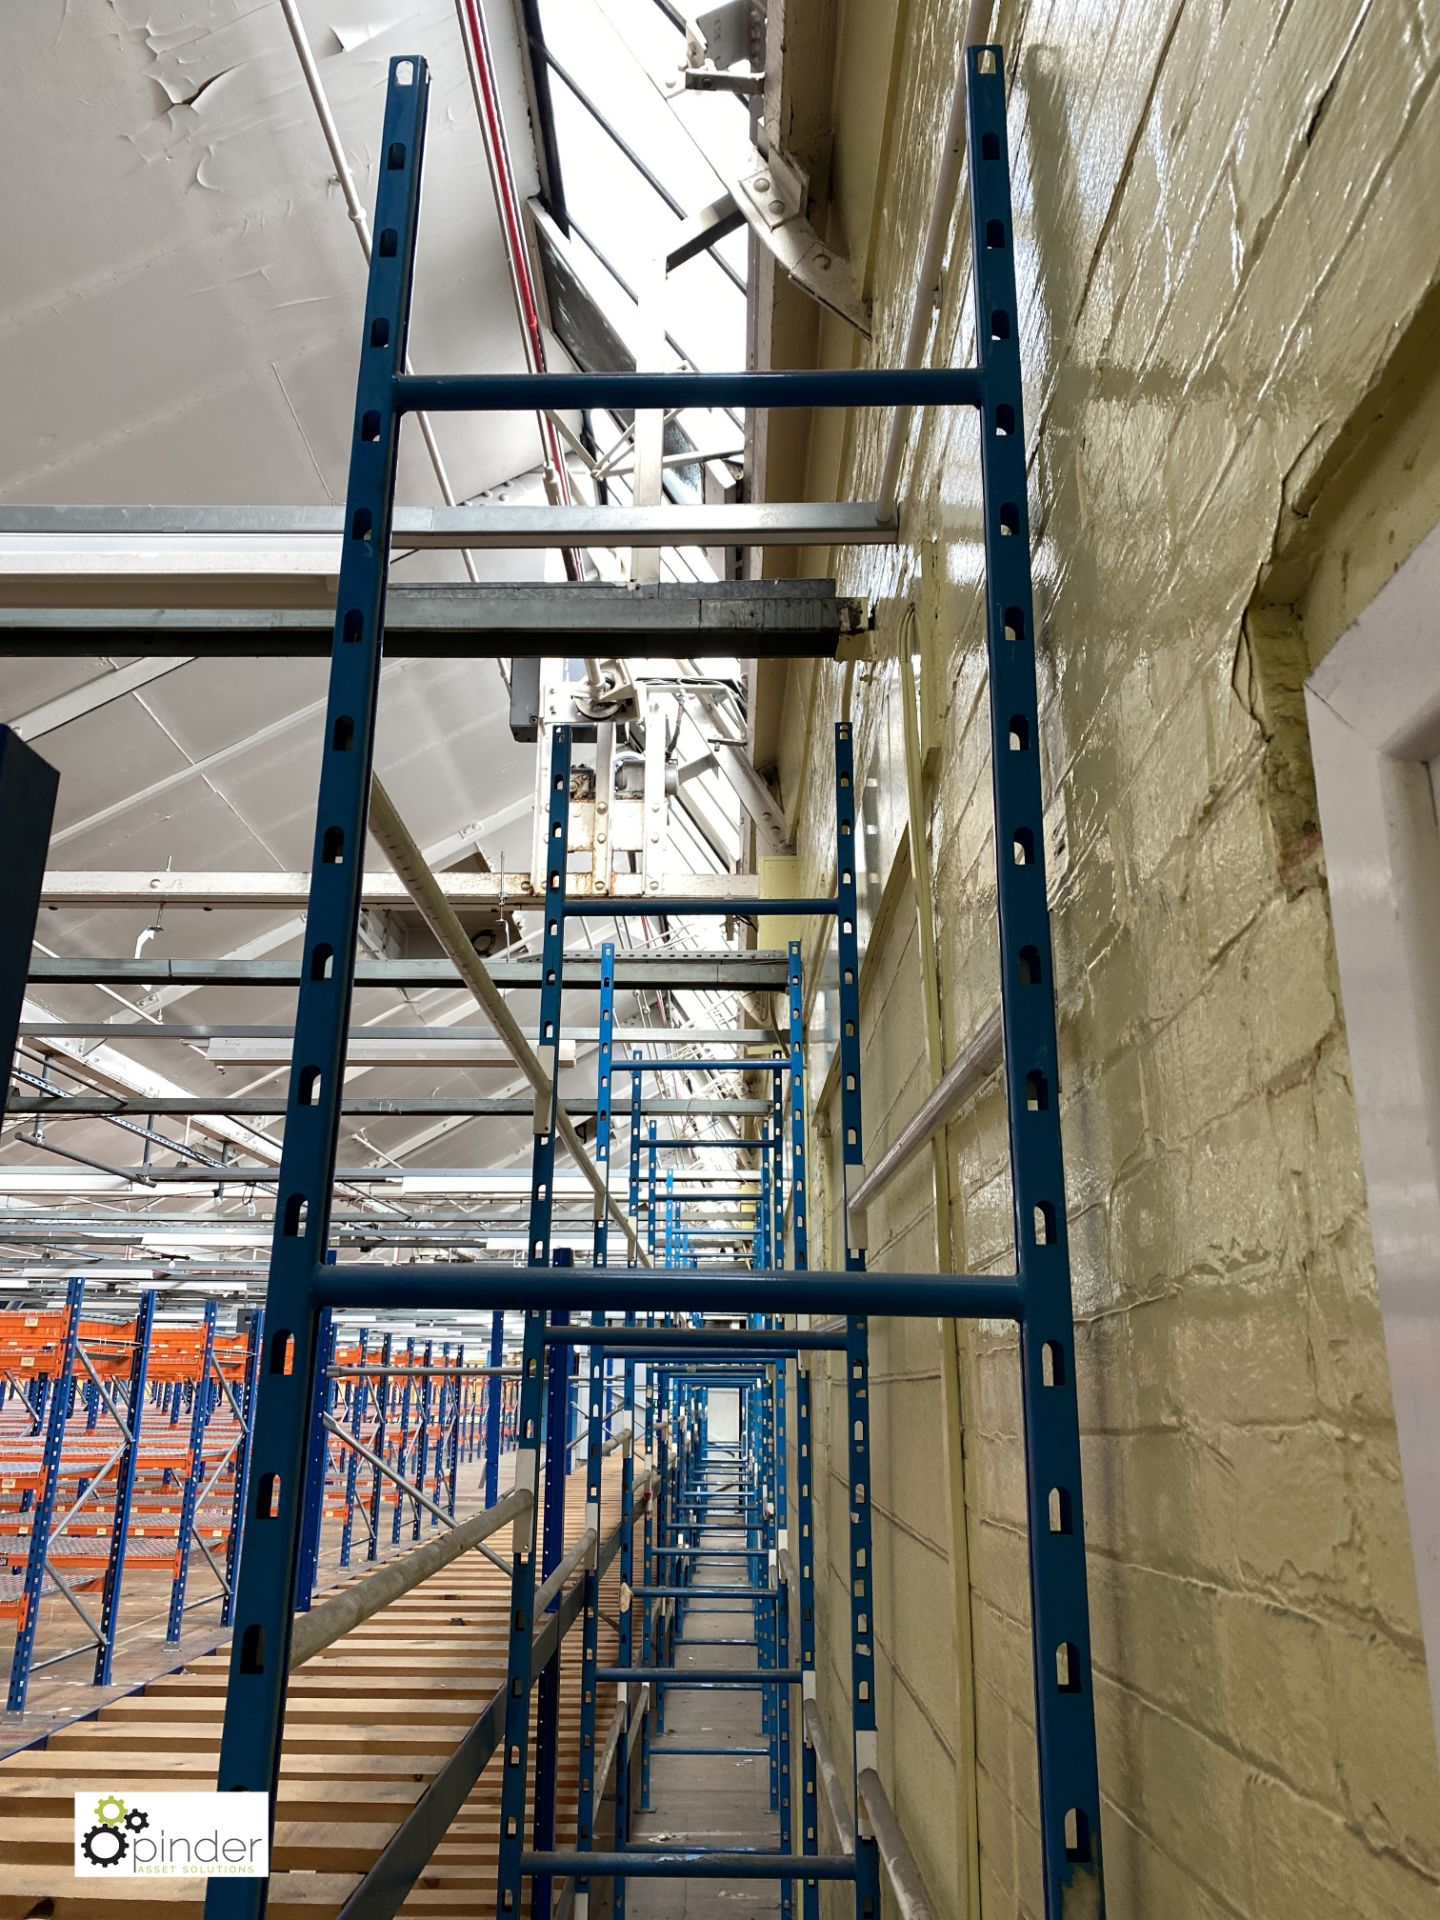 11 bays boltless Garment Hanging Racking, comprising 12 uprights 3050mm x 610mm, 55 tubular rails - Image 3 of 4